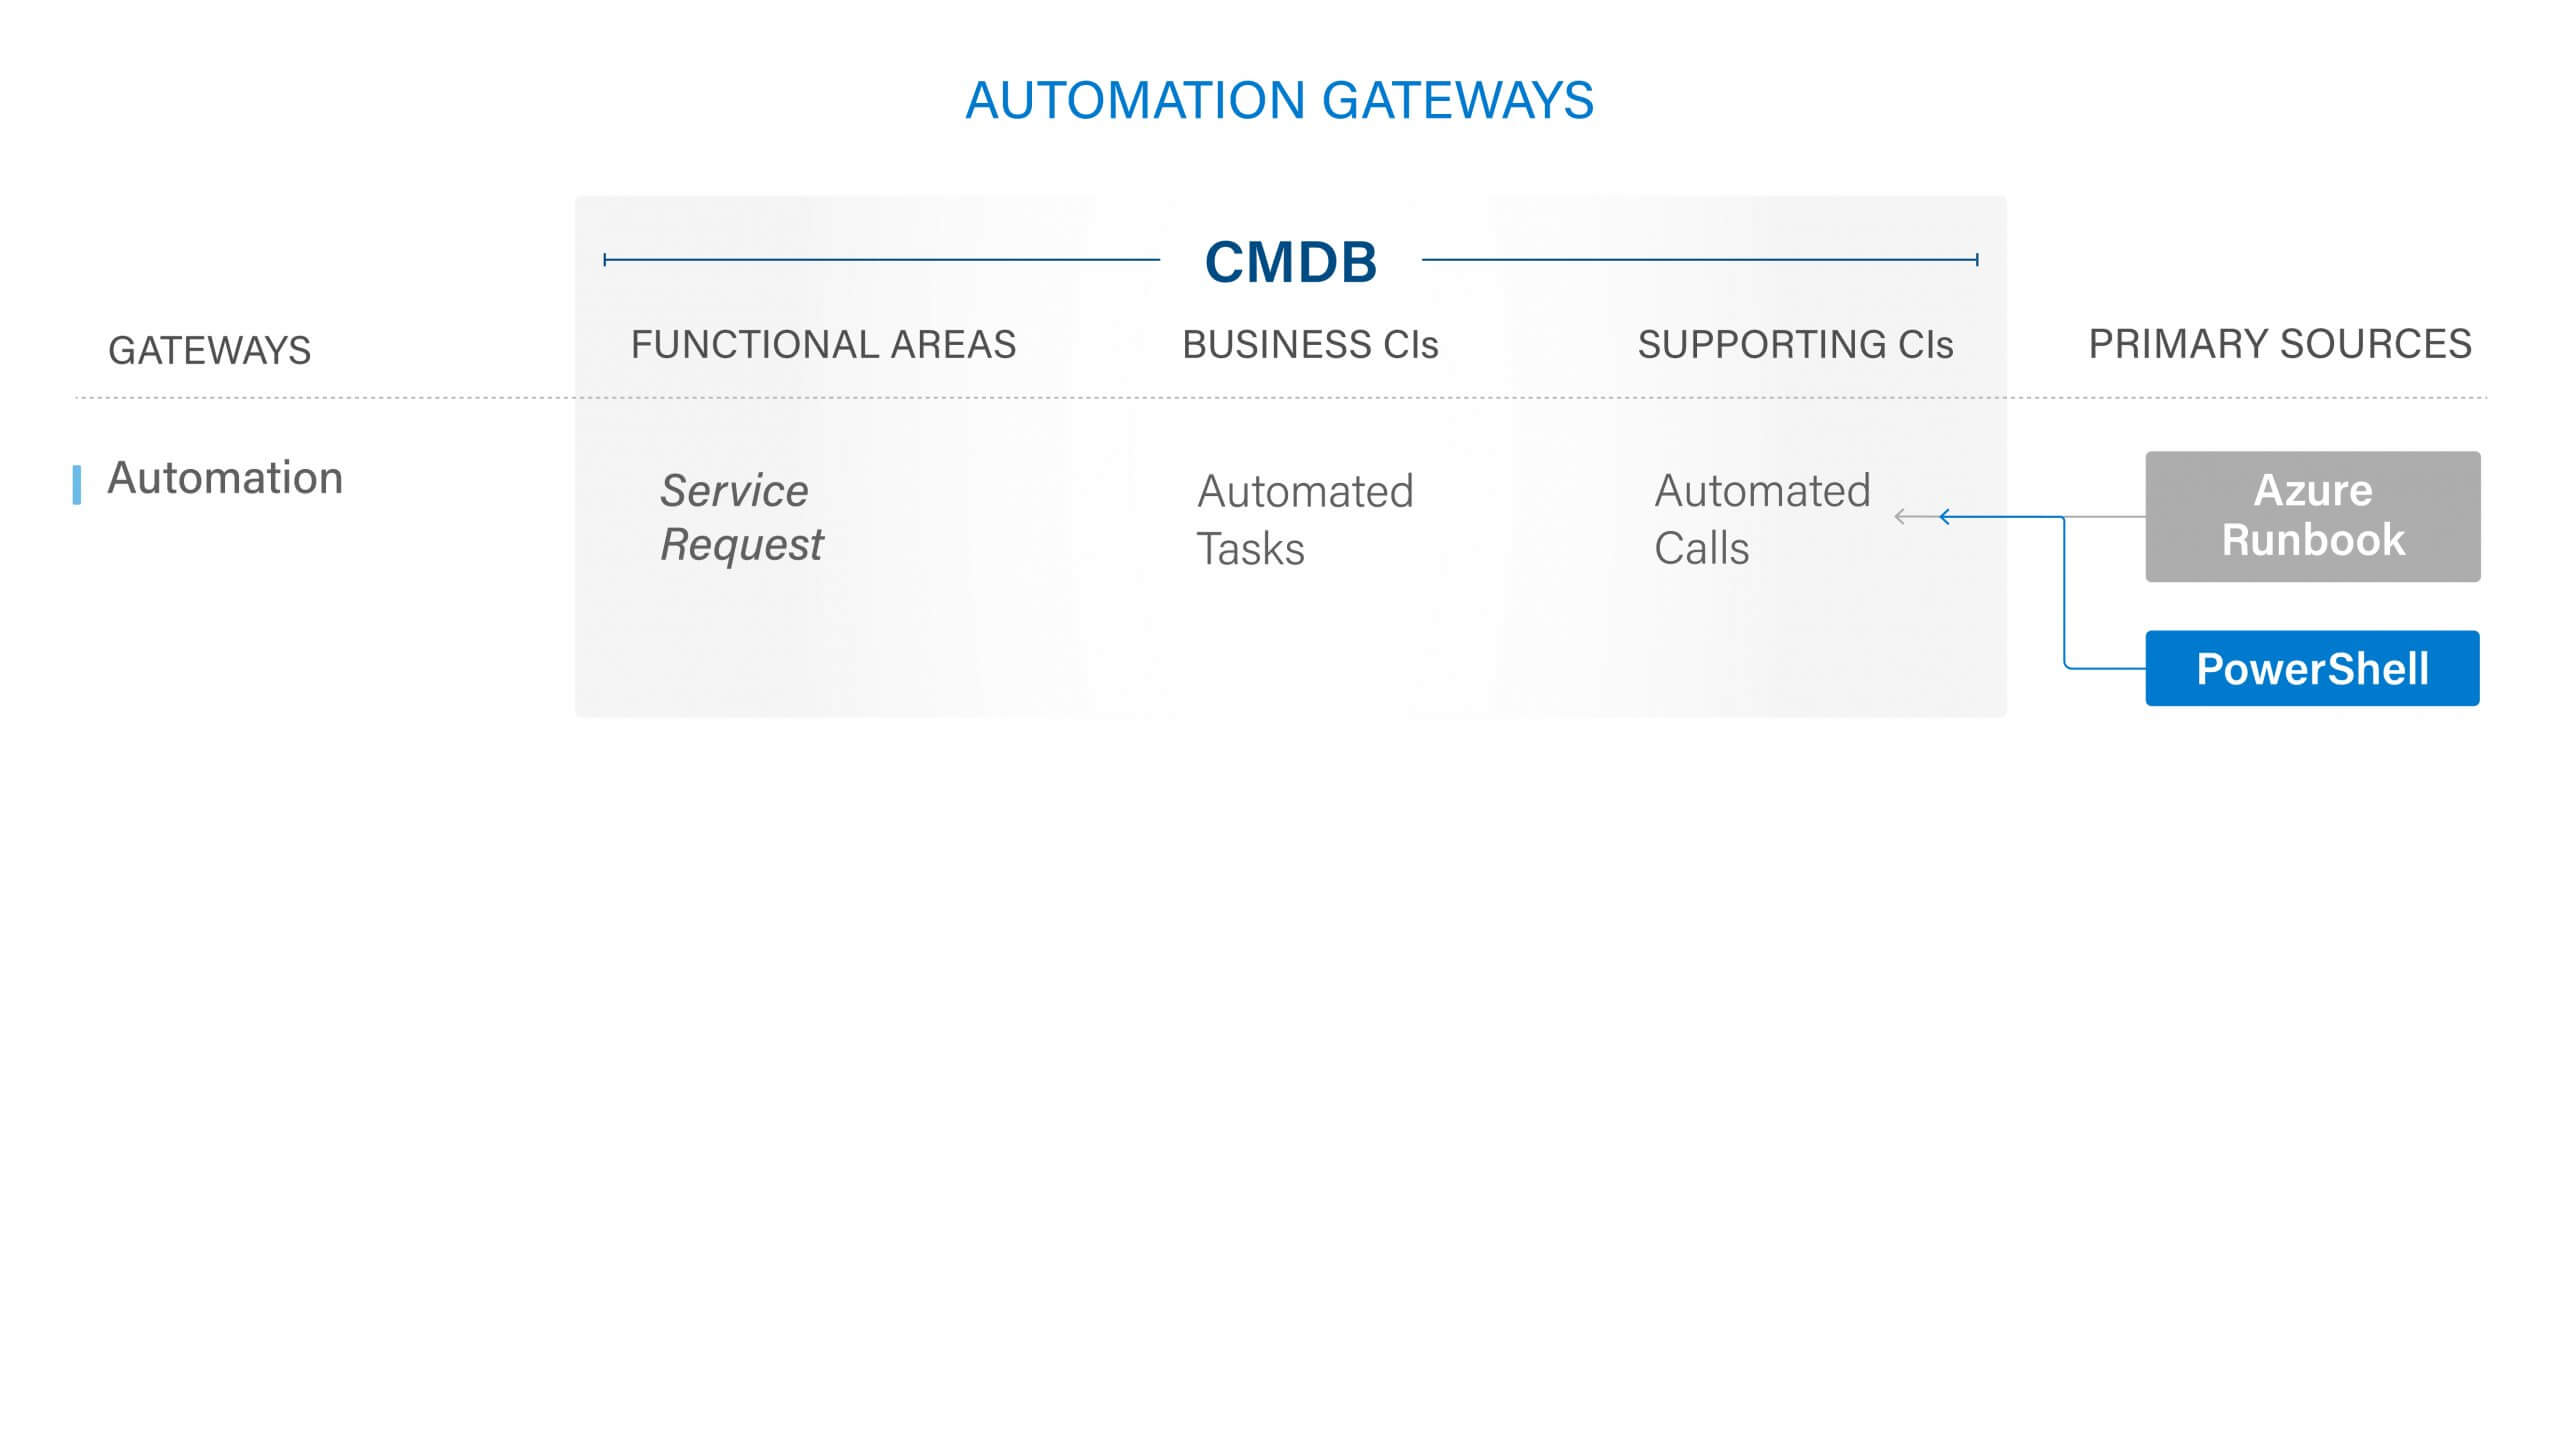 Automation Gateways Diagram